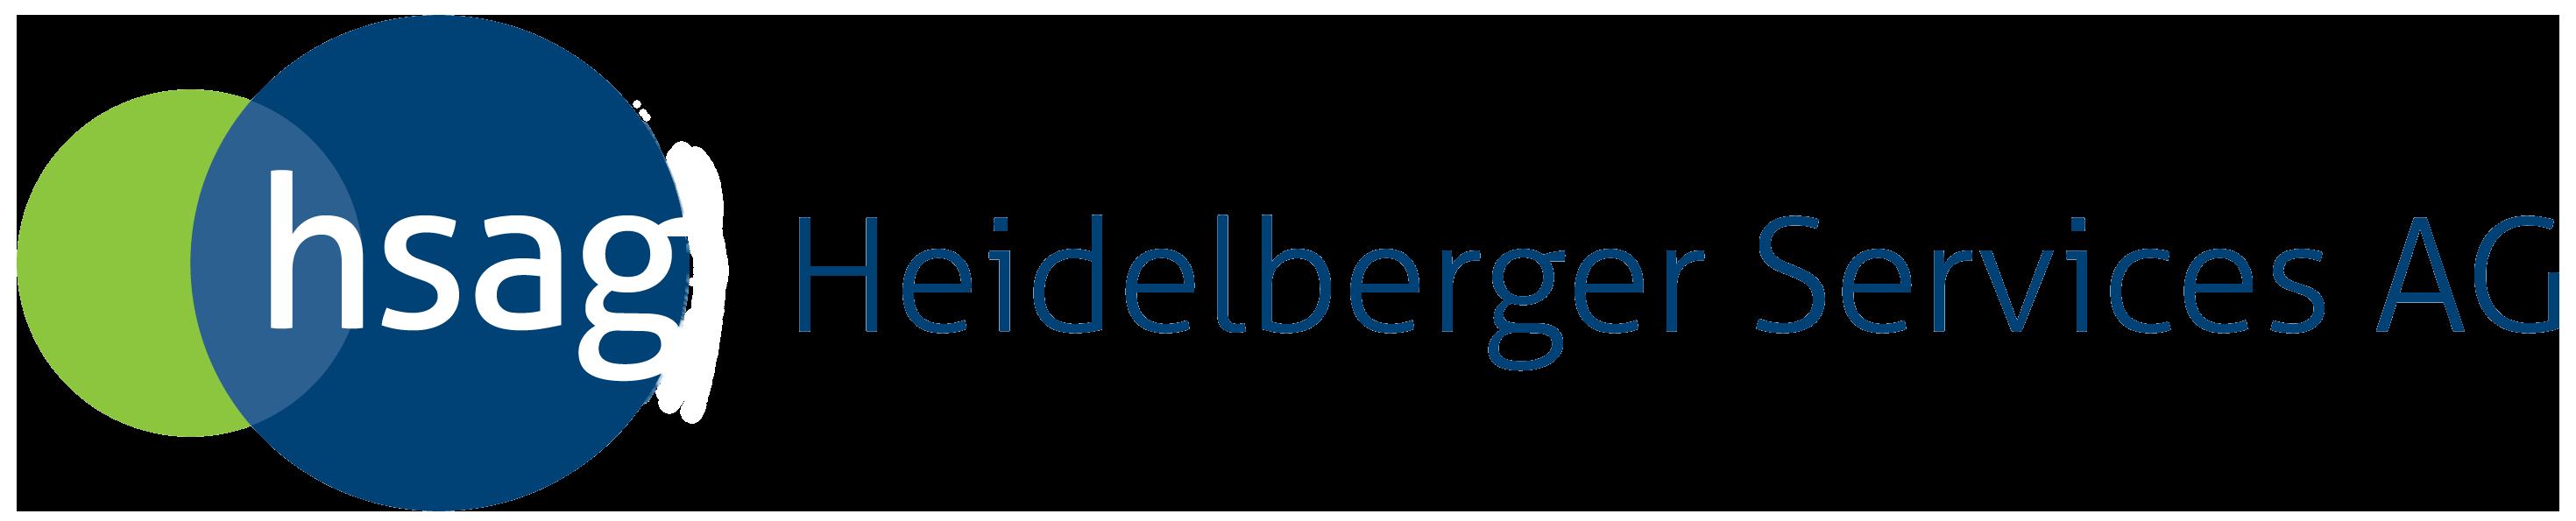 hsag Heidelberger Services AG